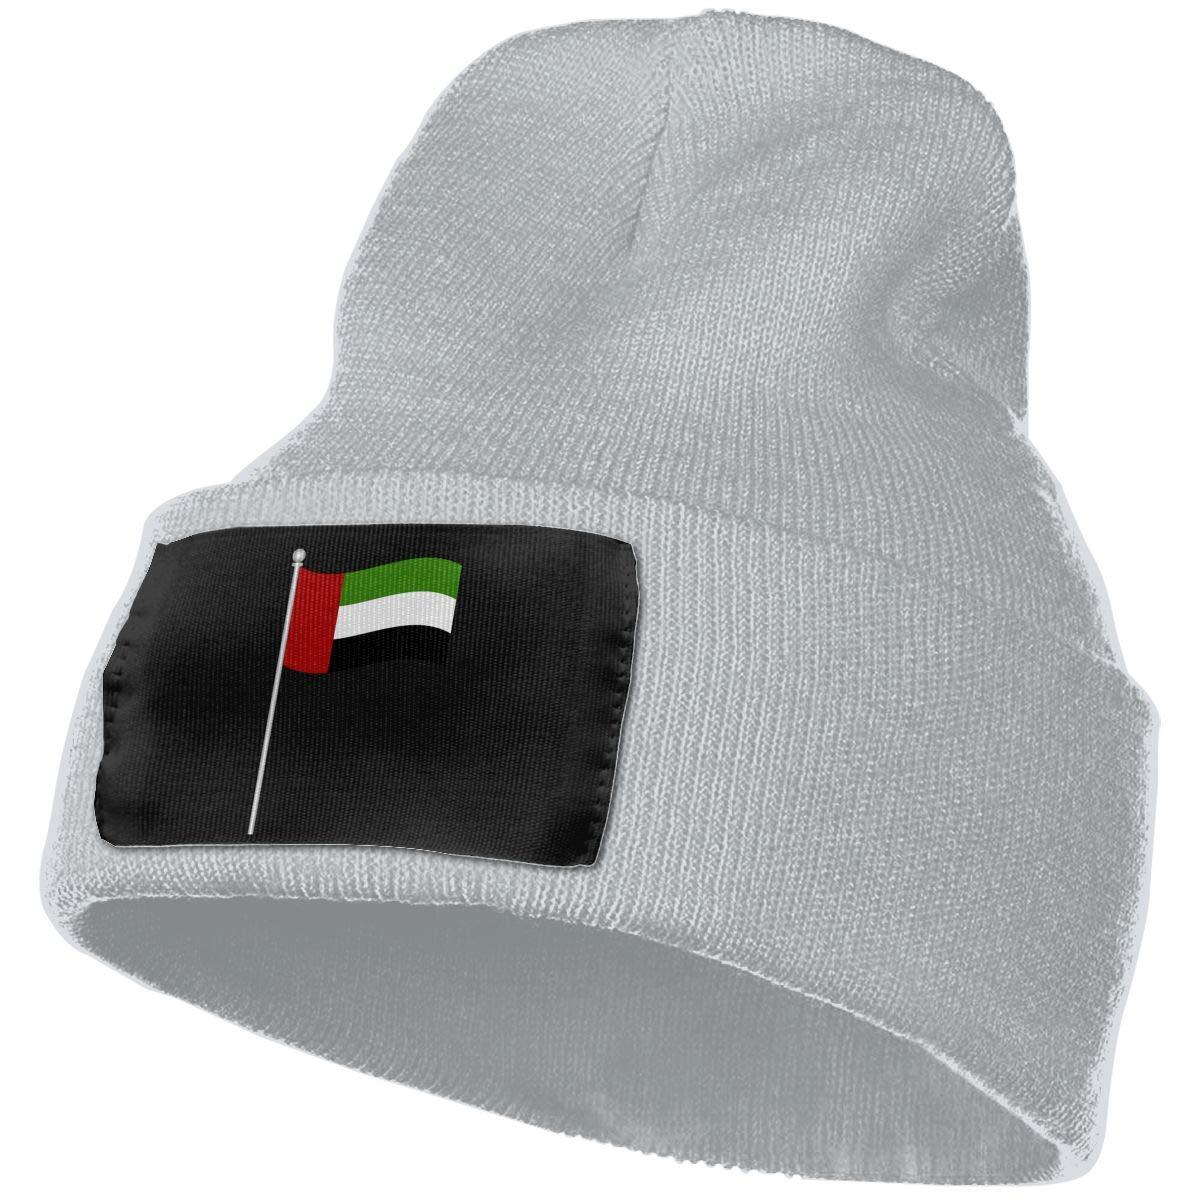 SLADDD1 Flag-of-UAE Warm Winter Hat Knit Beanie Skull Cap Cuff Beanie Hat Winter Hats for Men /& Women